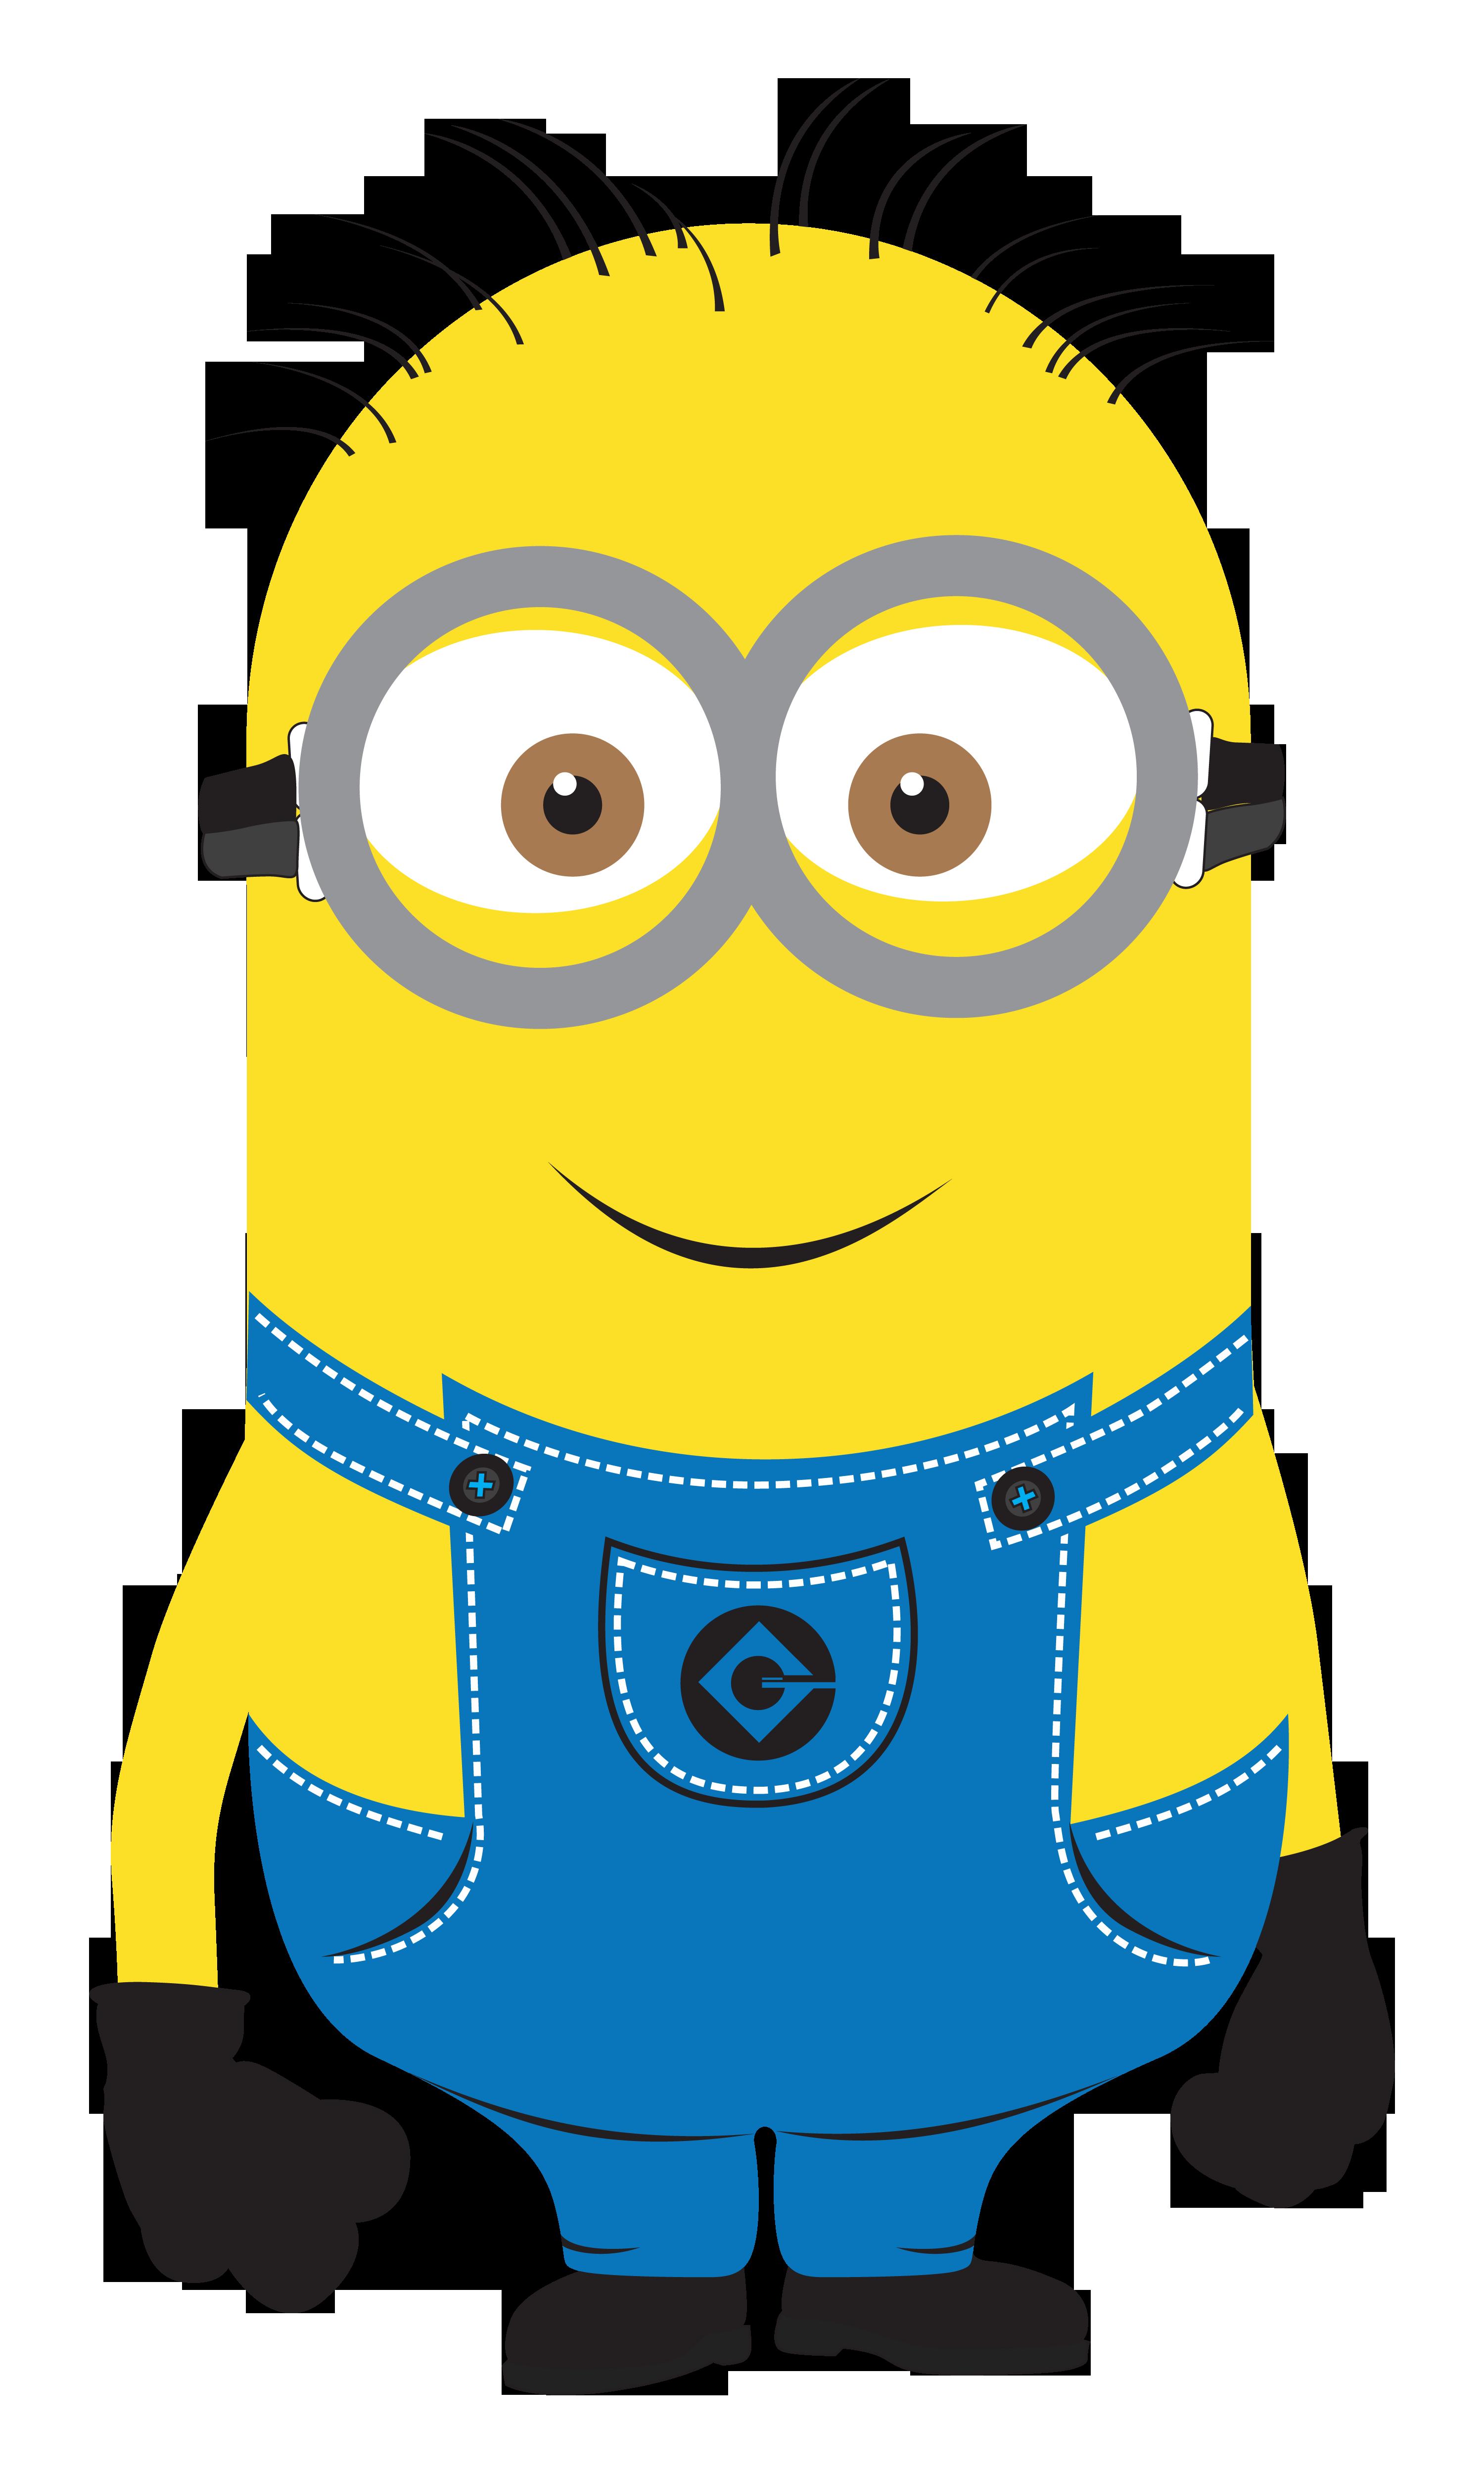 Number clipart minion Download Minions Clipart Minion Free